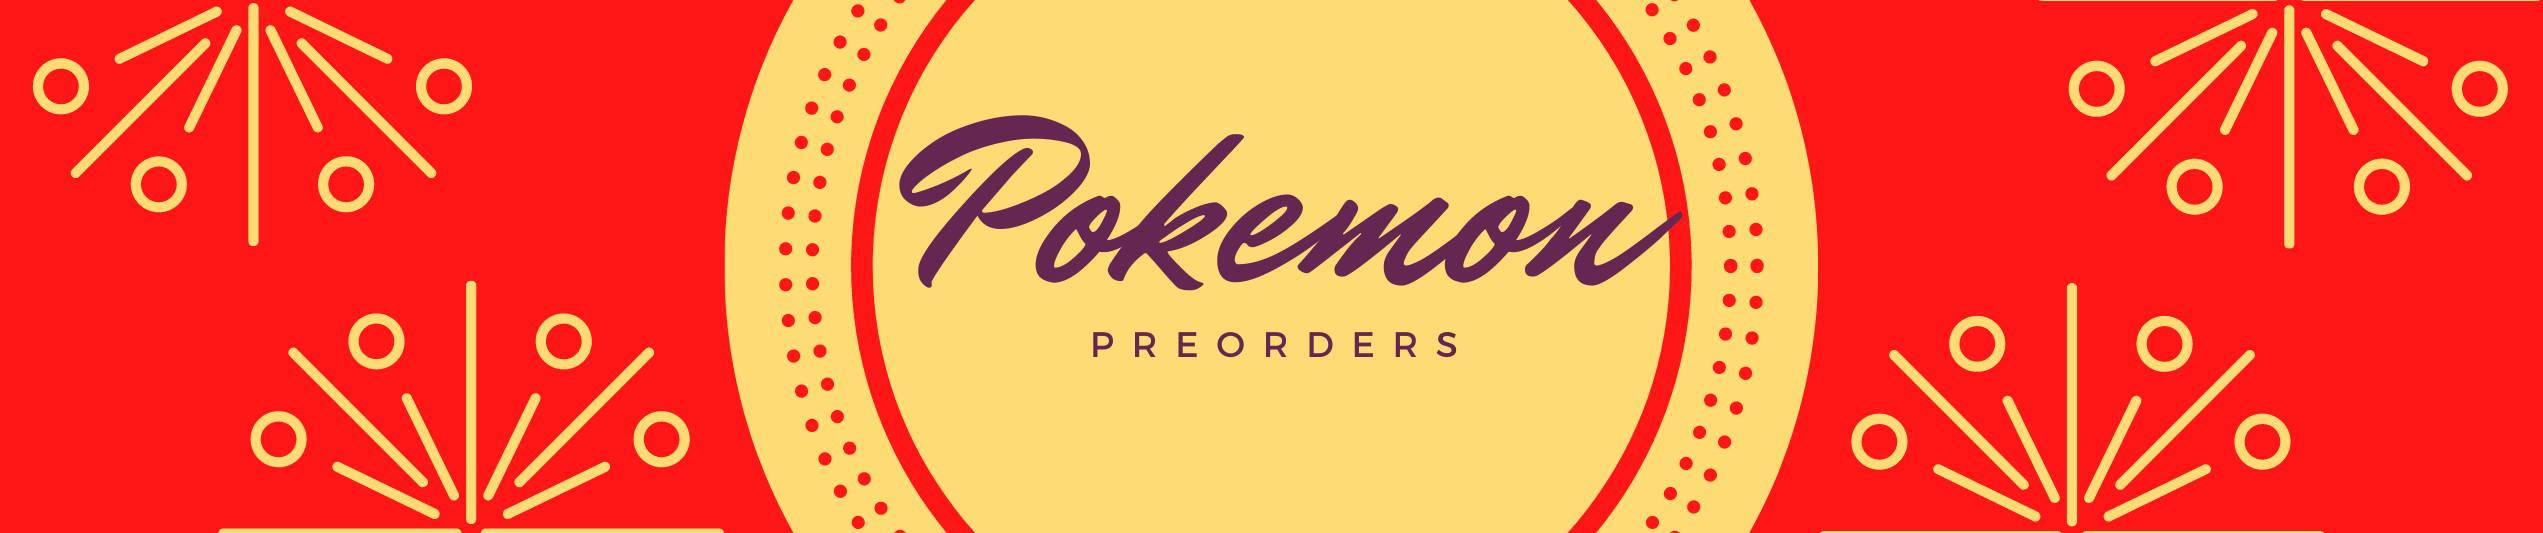 pokemon-card-preorders